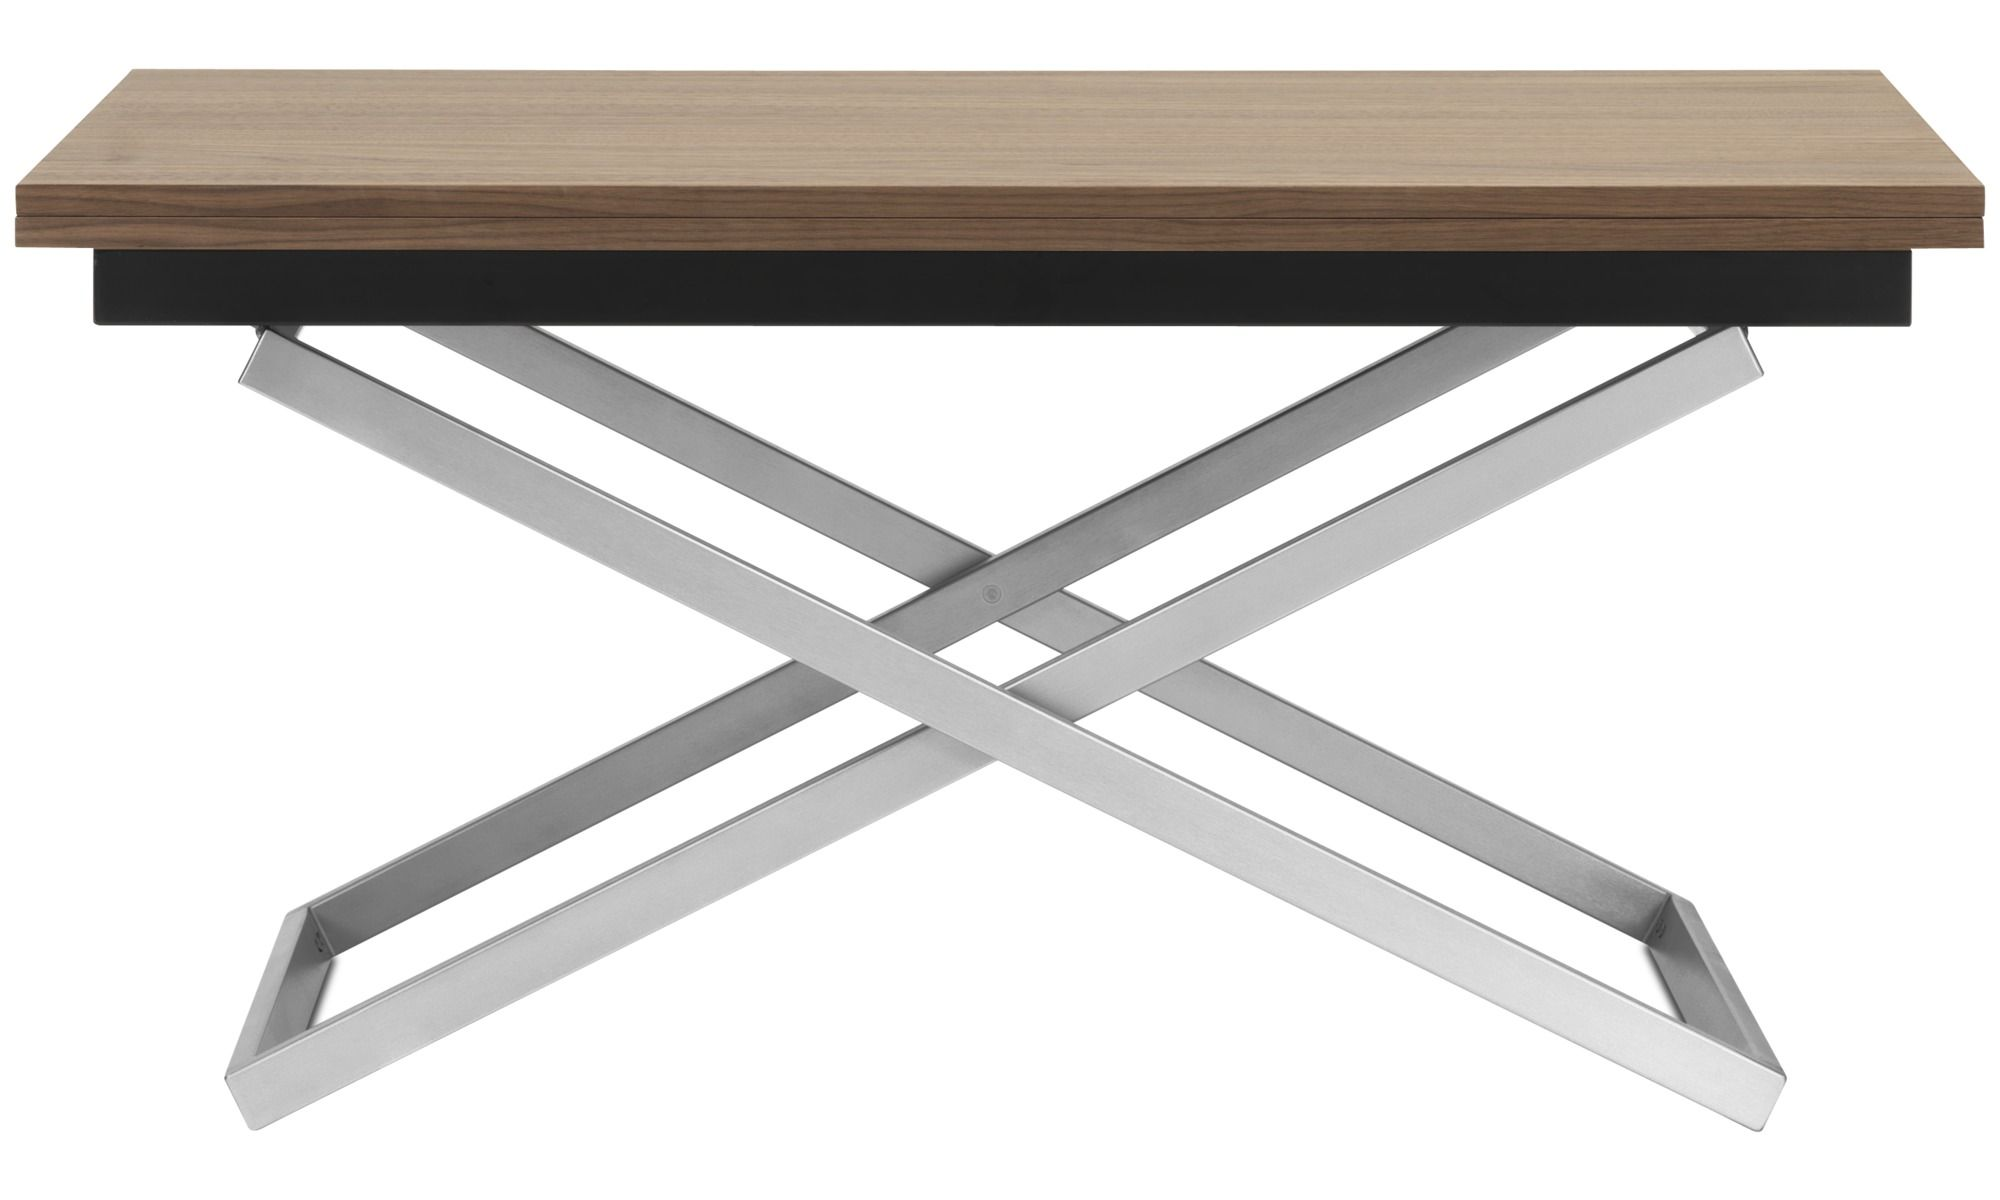 0da4513d2d0884f5bb5c7f01debfe031 Luxe De Mini Table Basse Concept